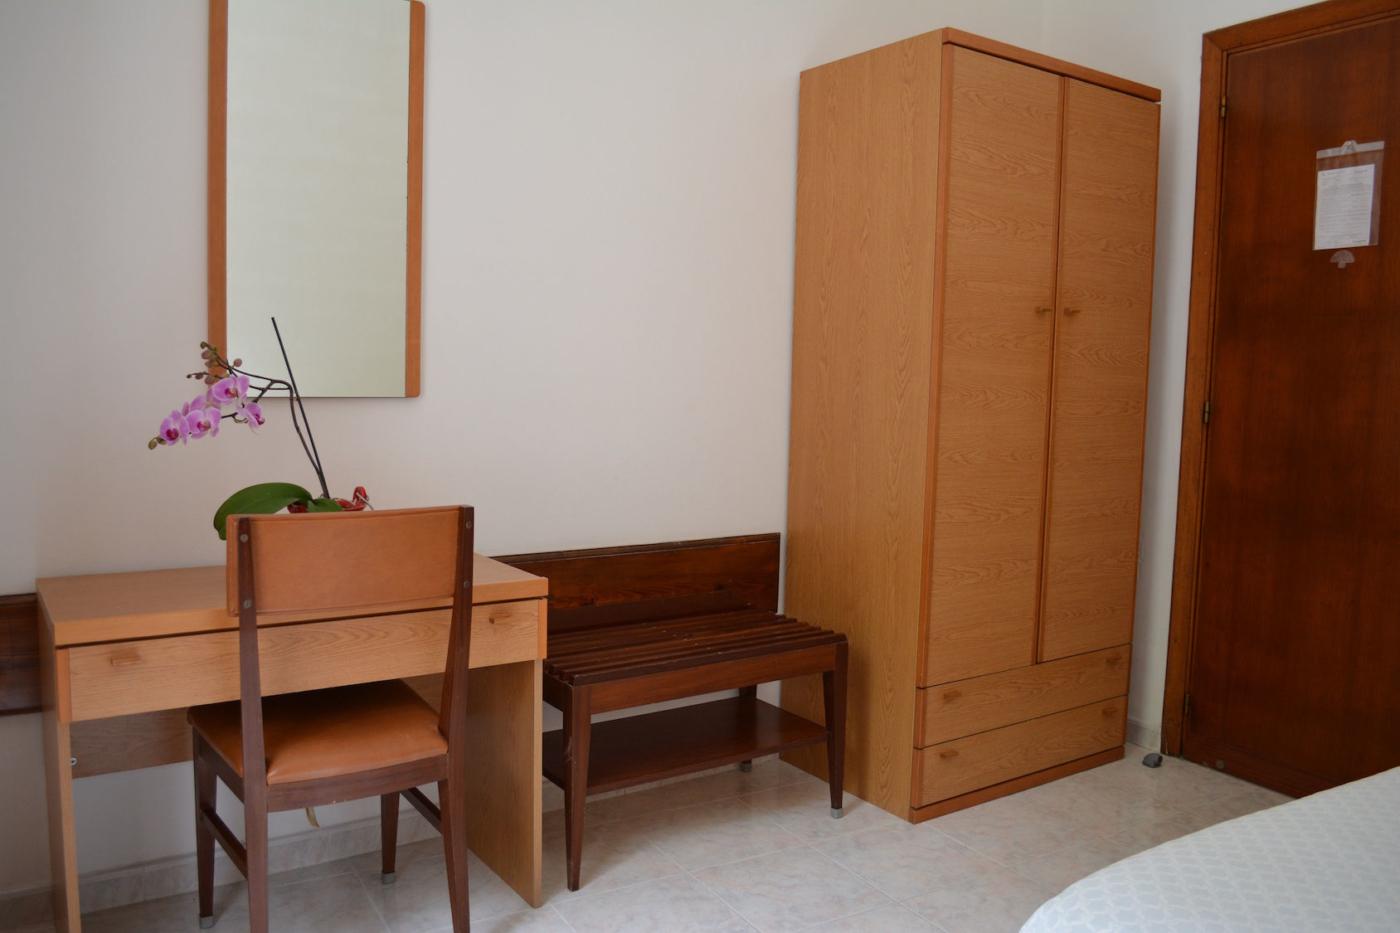 camera singola economy armadio e tavoli